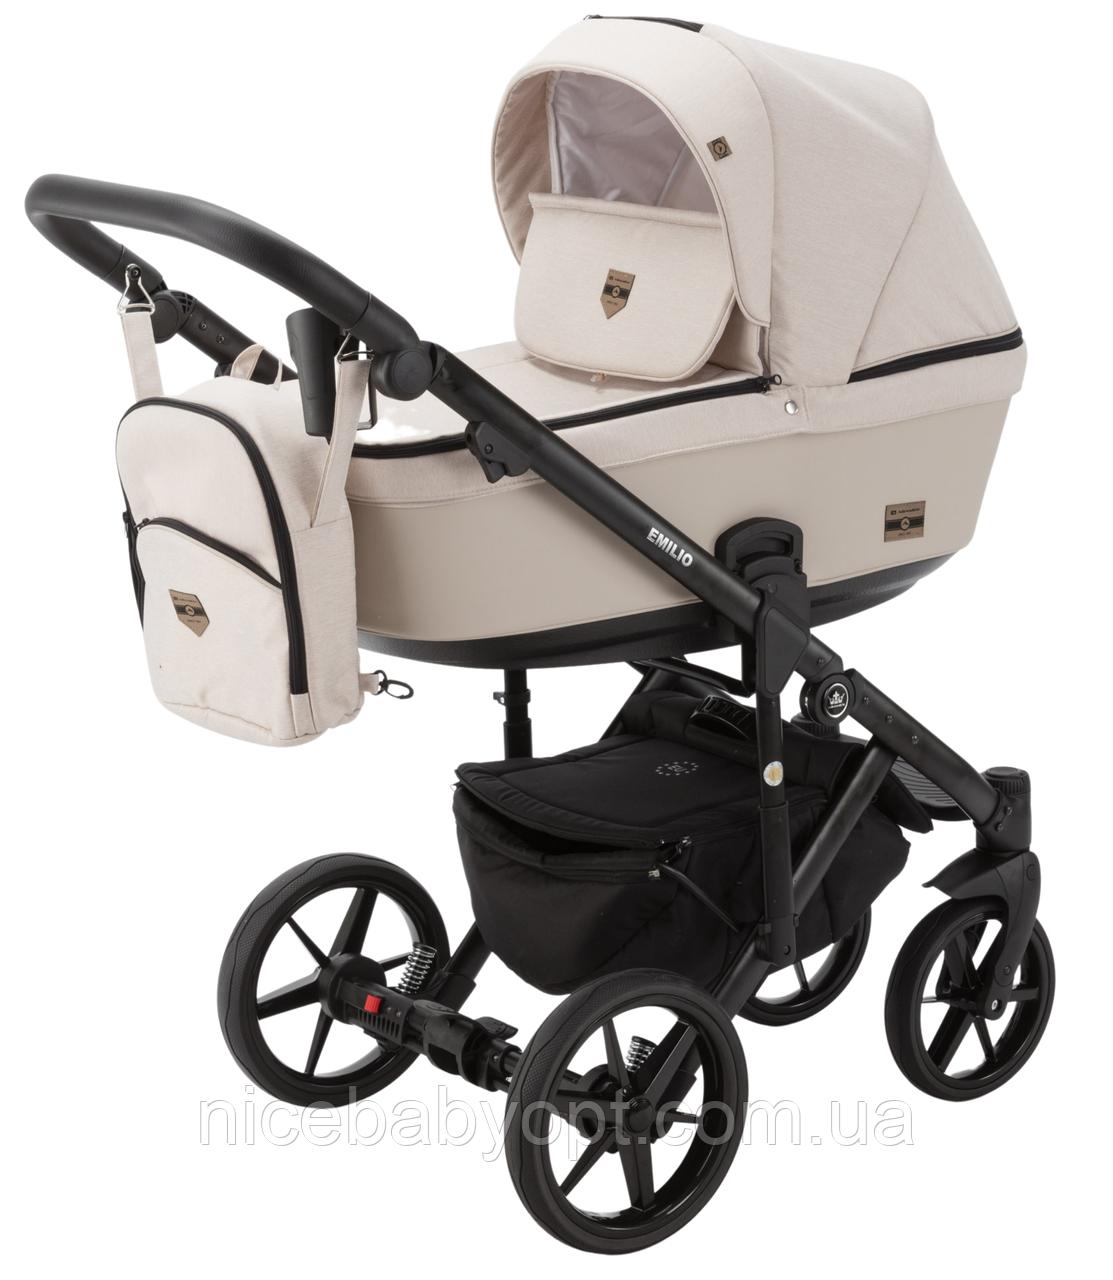 Дитяча універсальна коляска 2 в 1 Adamex Emilio EM-243